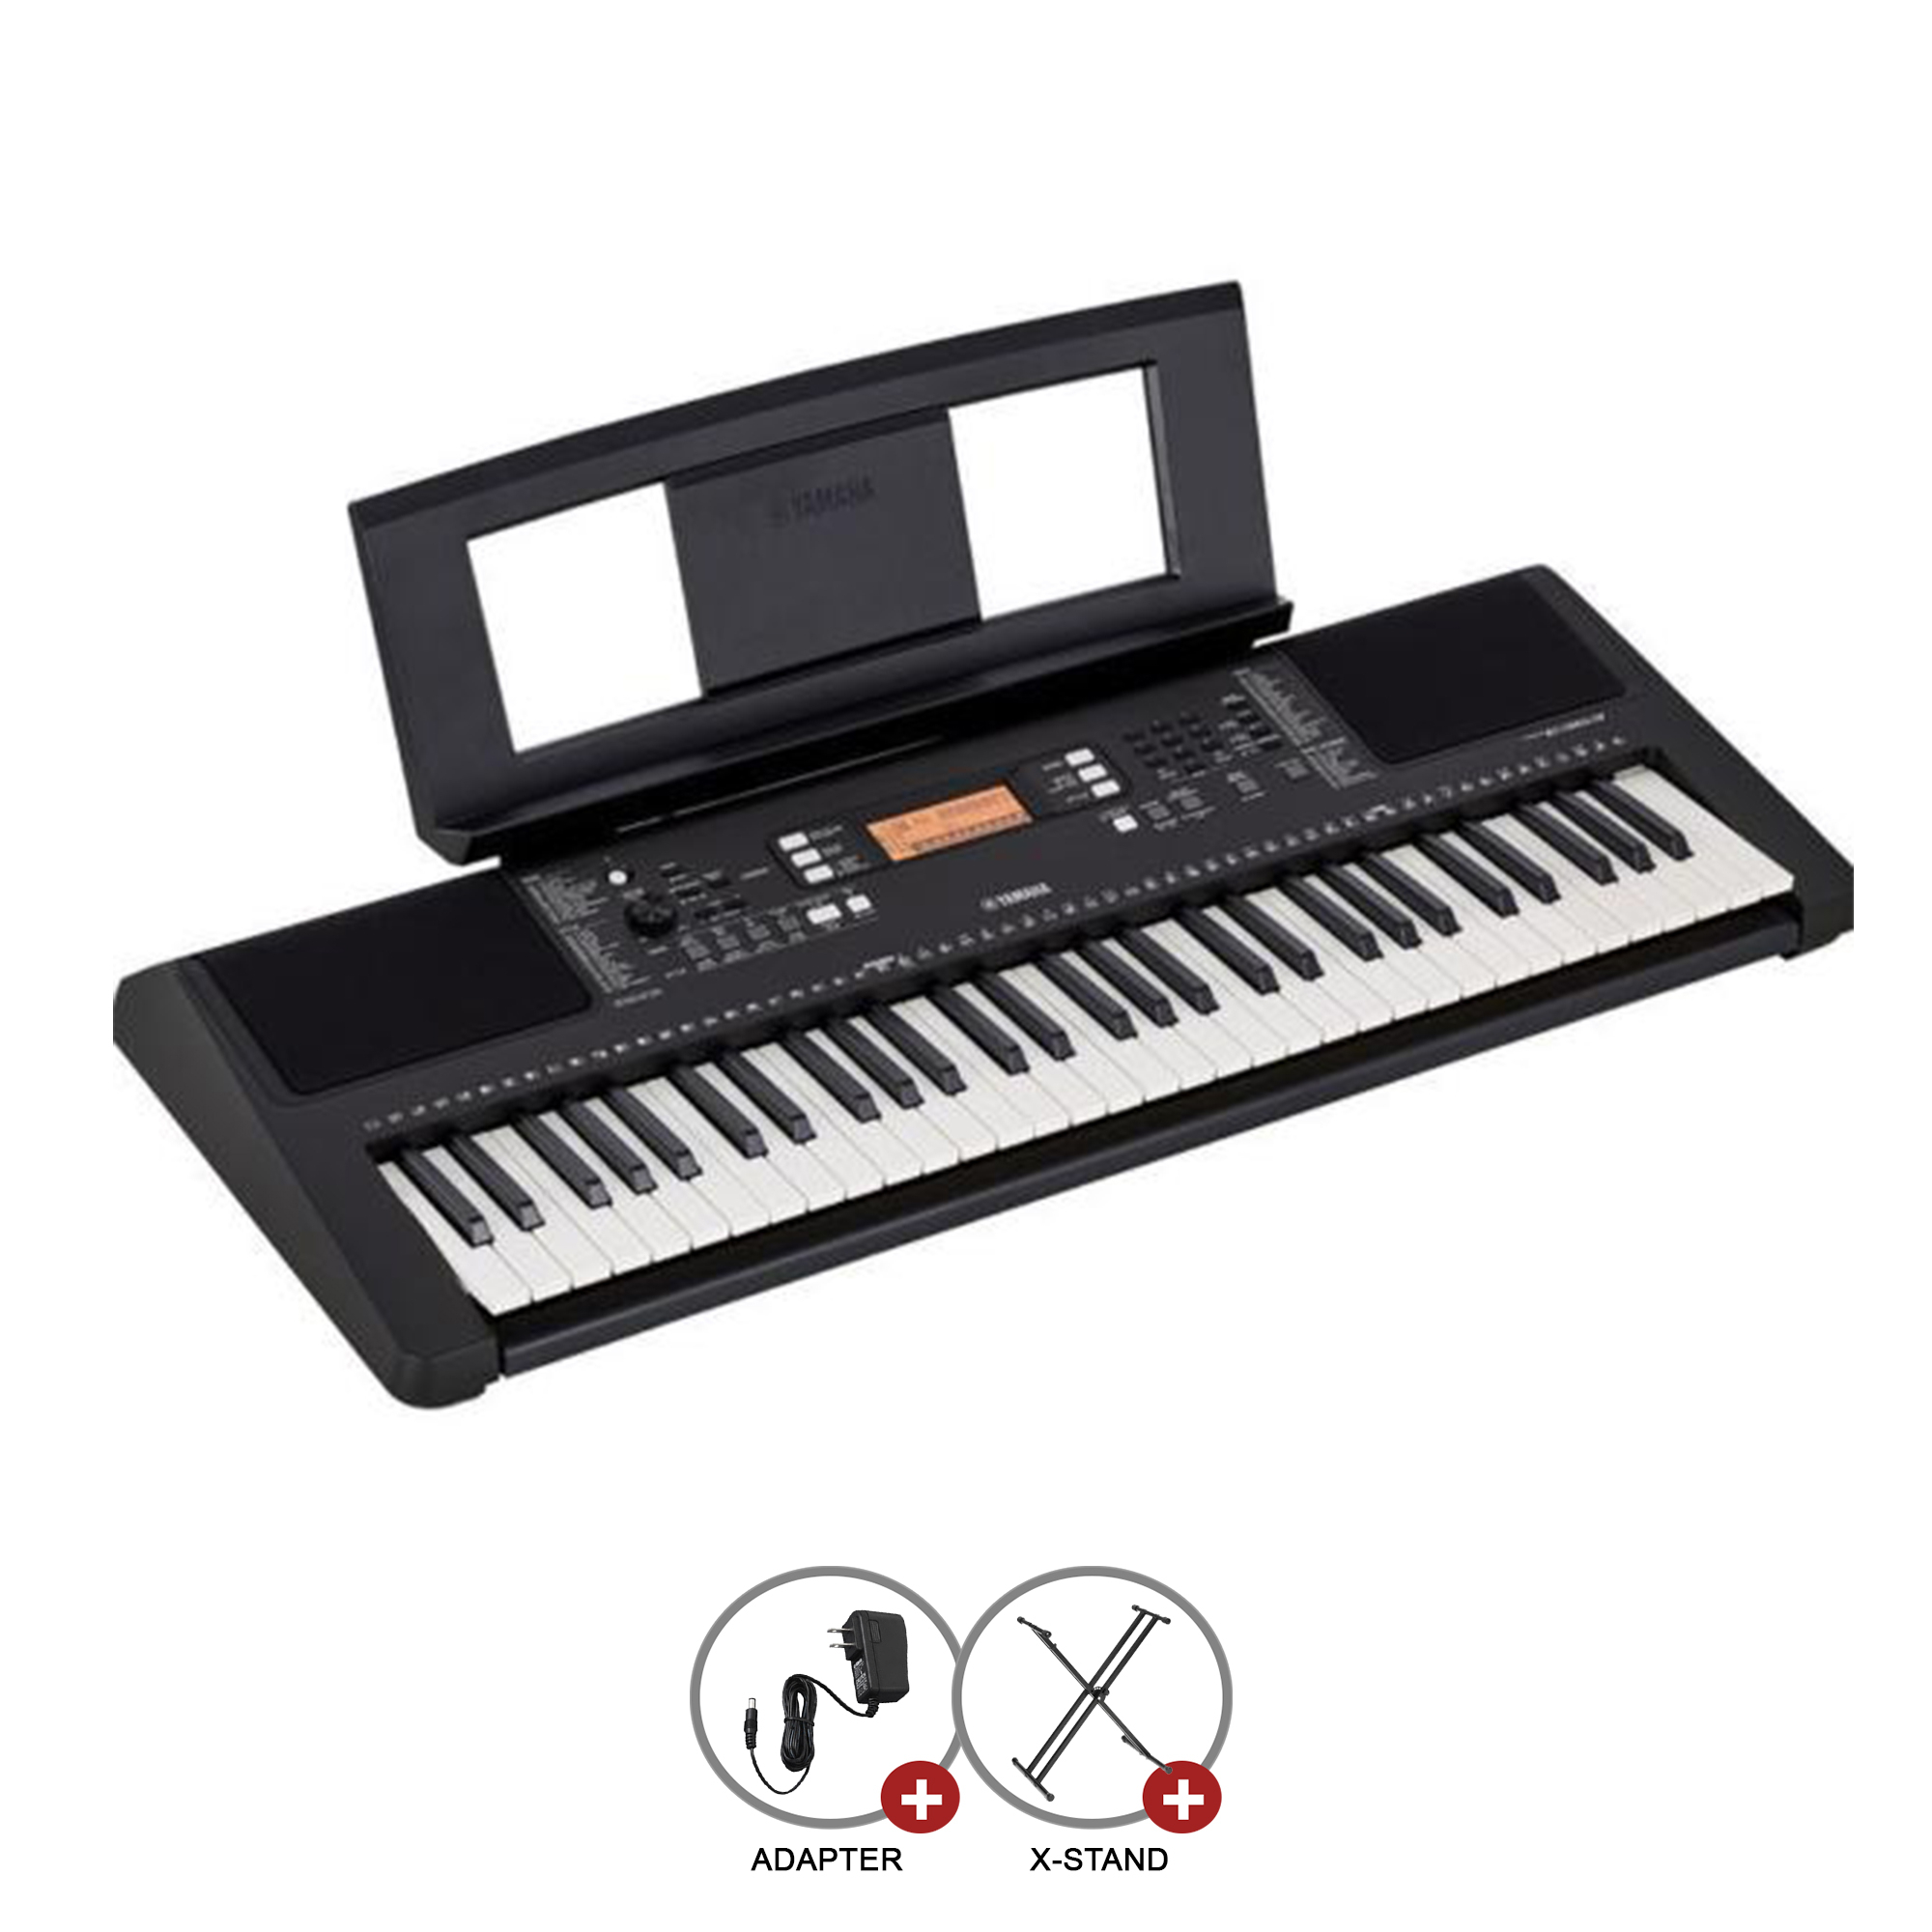 Yamaha Psre363 Portable Digital 61 Keys Keyboard With inside Yamaha Singapore Calendar